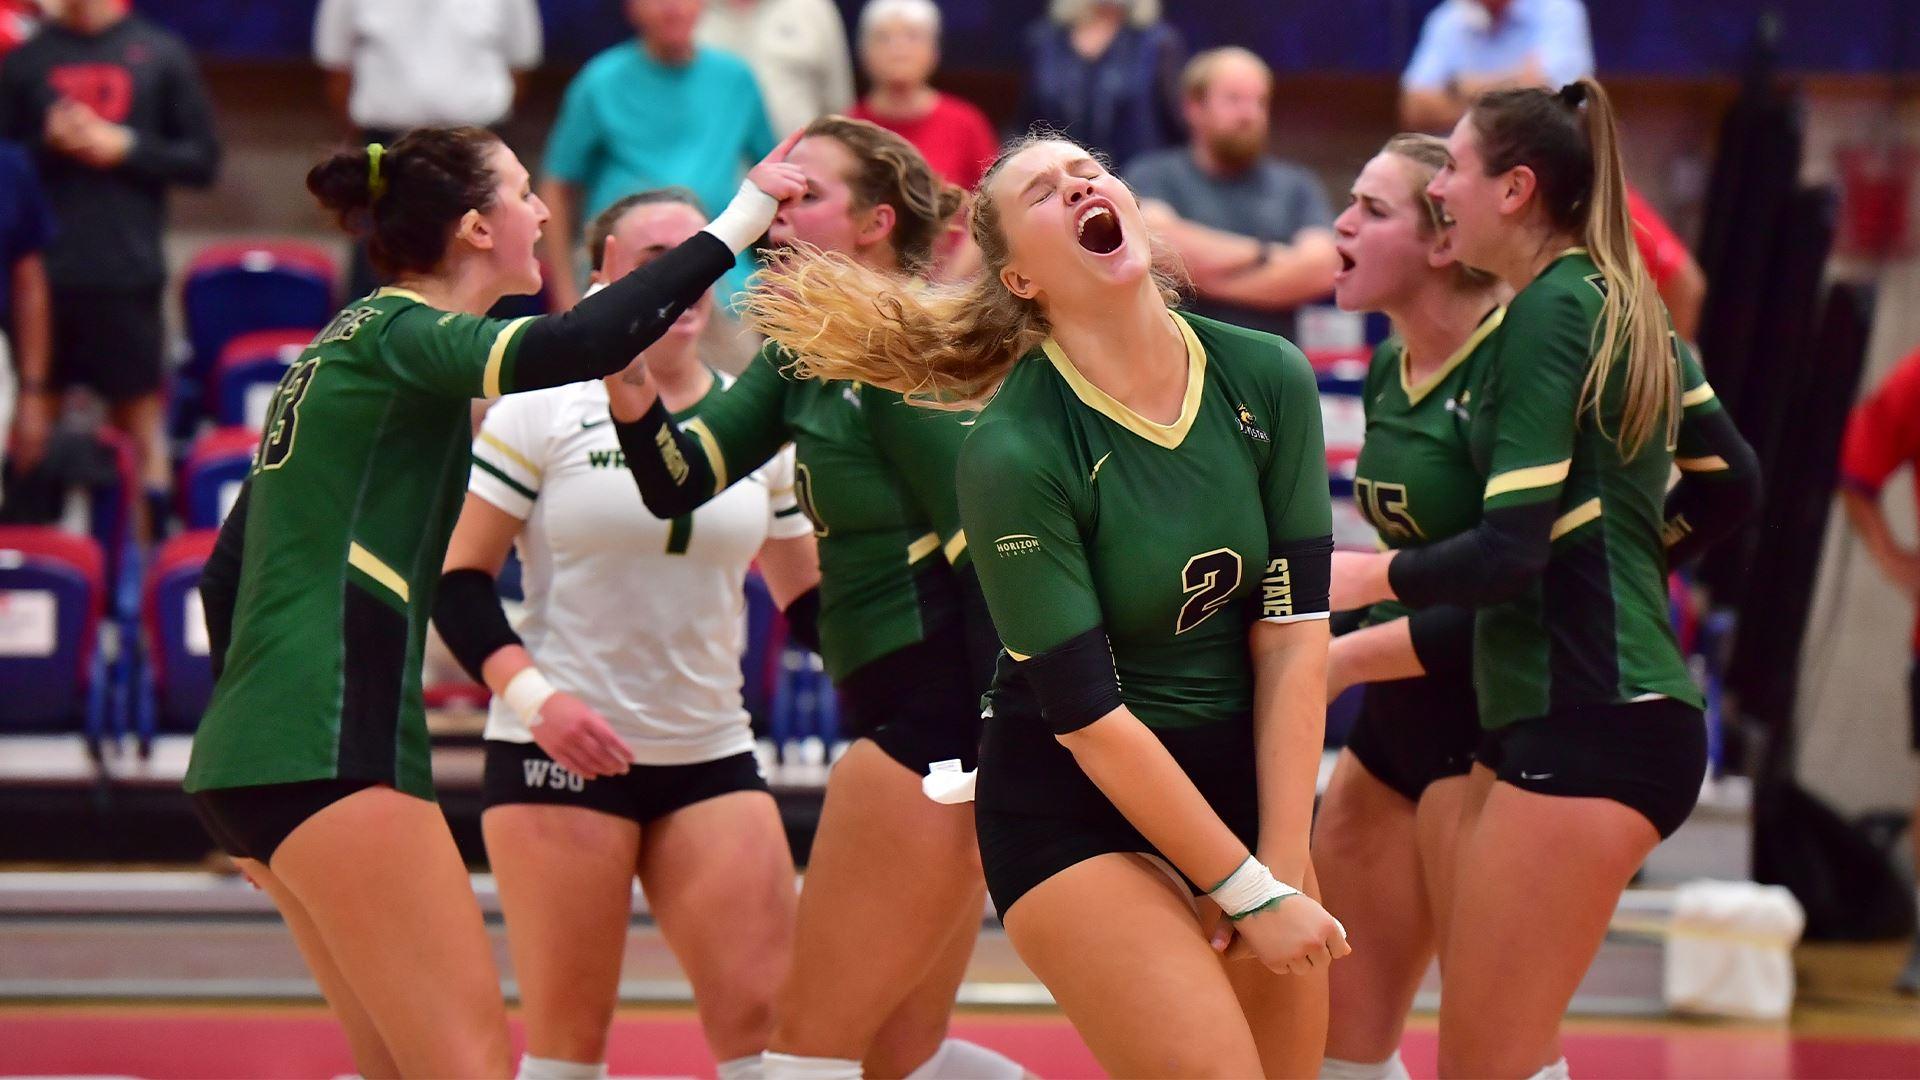 Raiders vs. University of Dayton Women's Volleyball Game